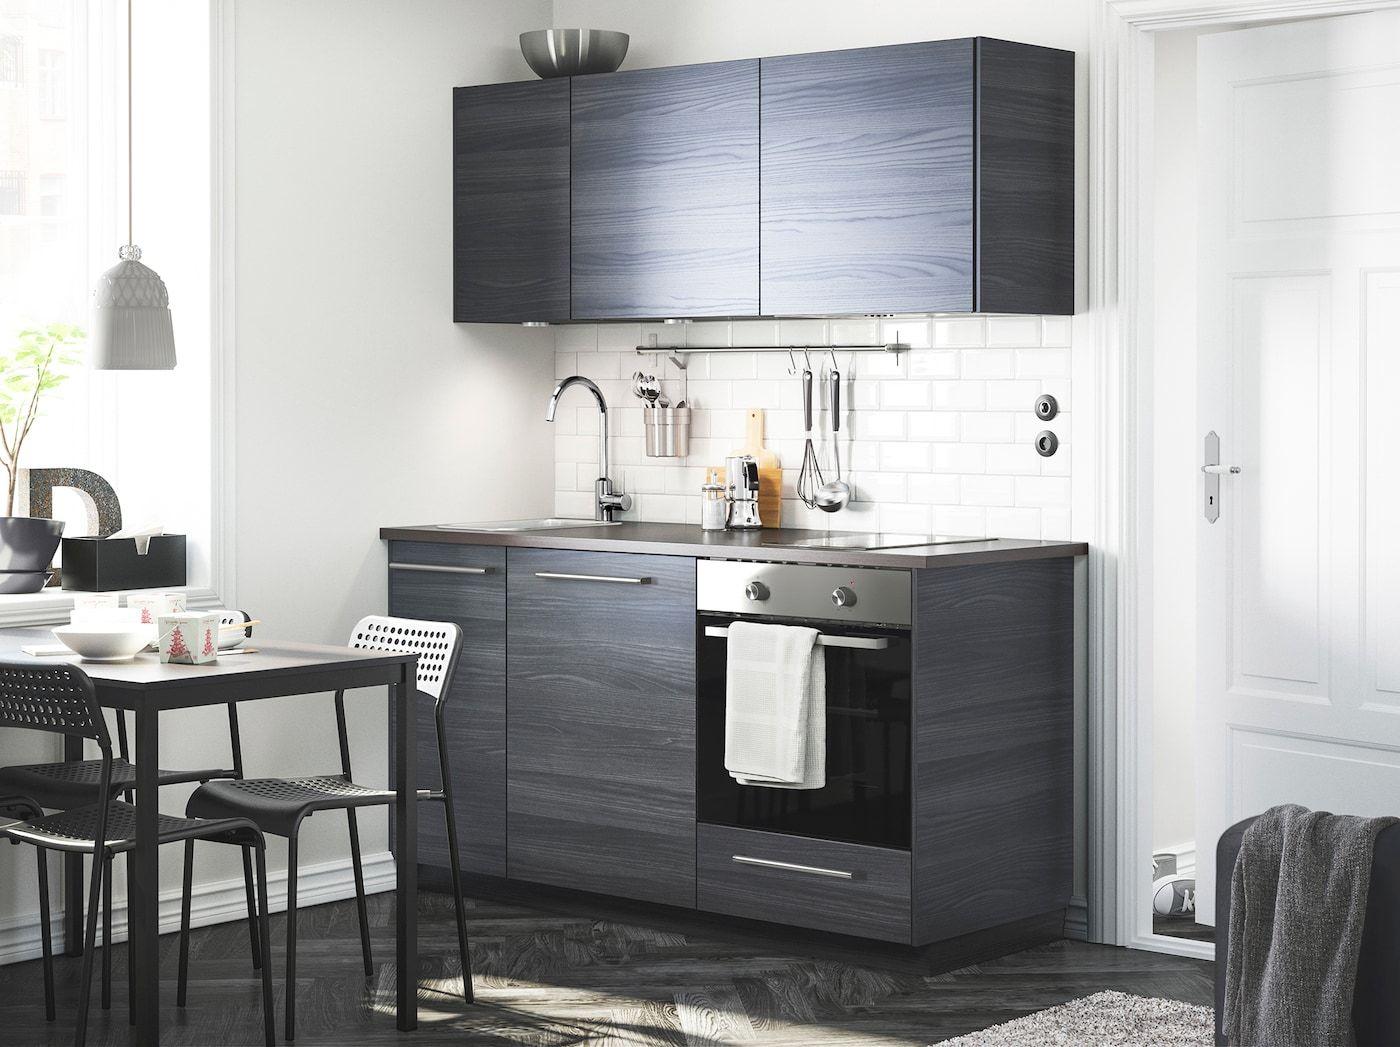 Küche & Kochbereich Ideen & Inspirationen   Billige ...